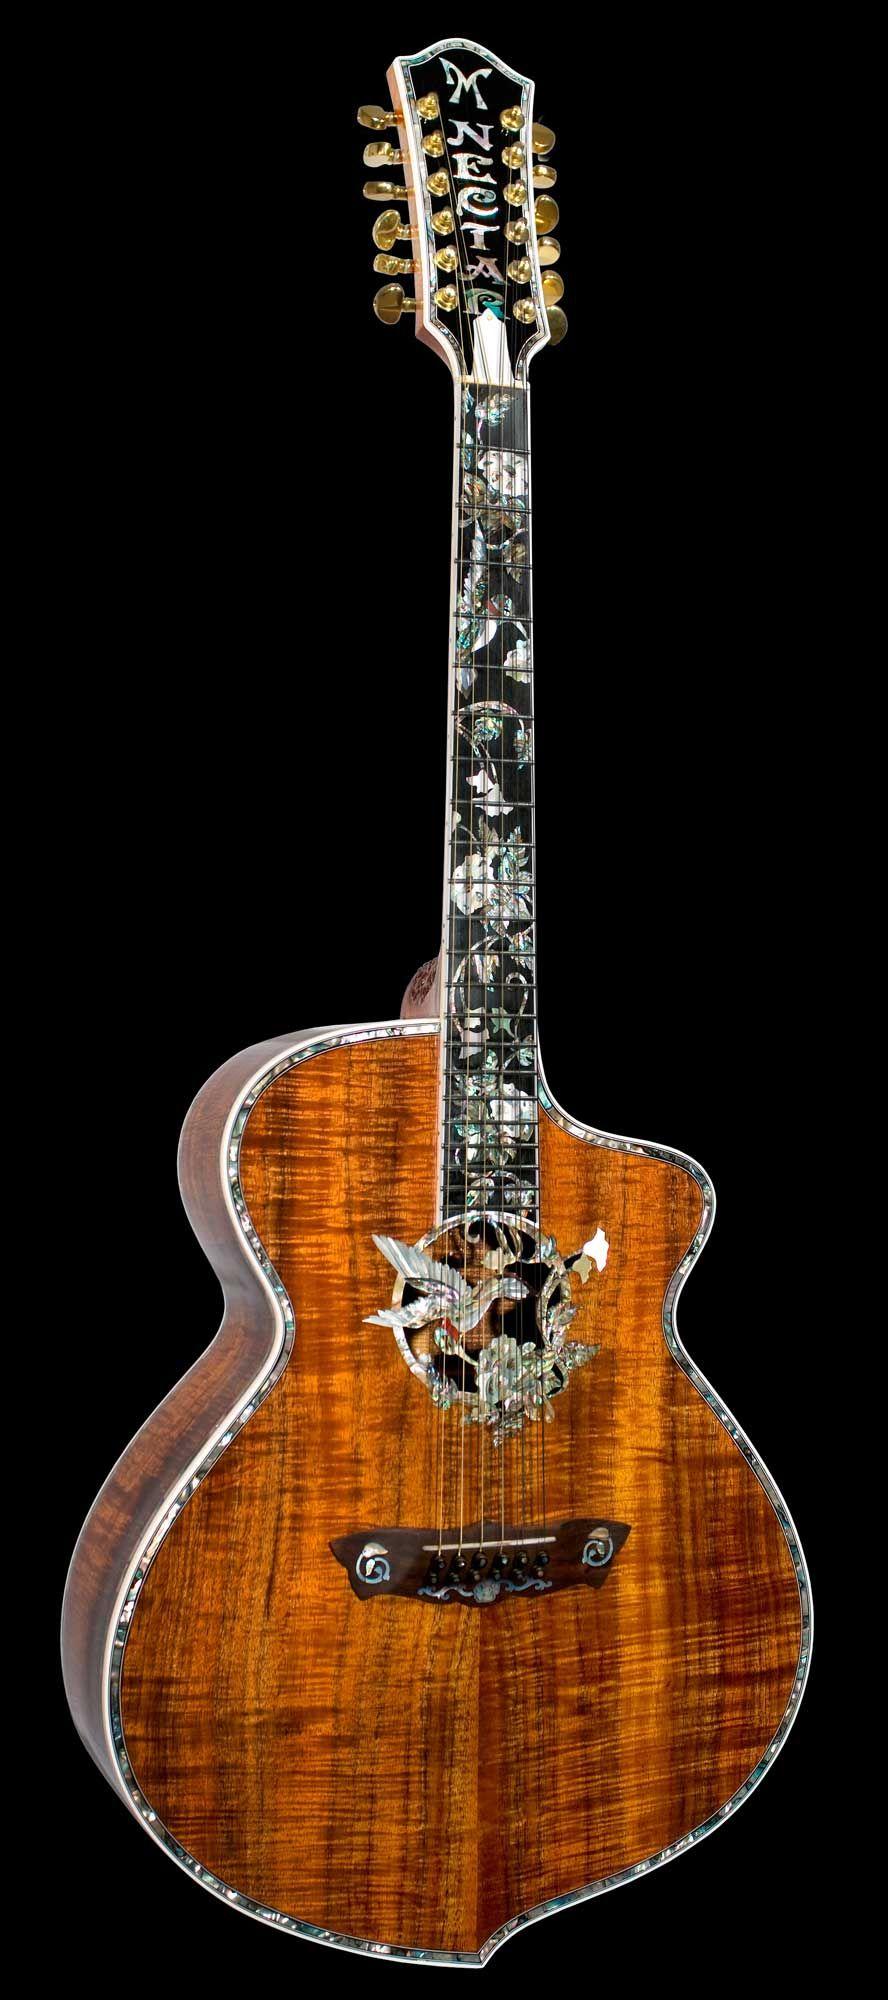 minarik guitars custom 12 string acoustic guitars pinterest. Black Bedroom Furniture Sets. Home Design Ideas